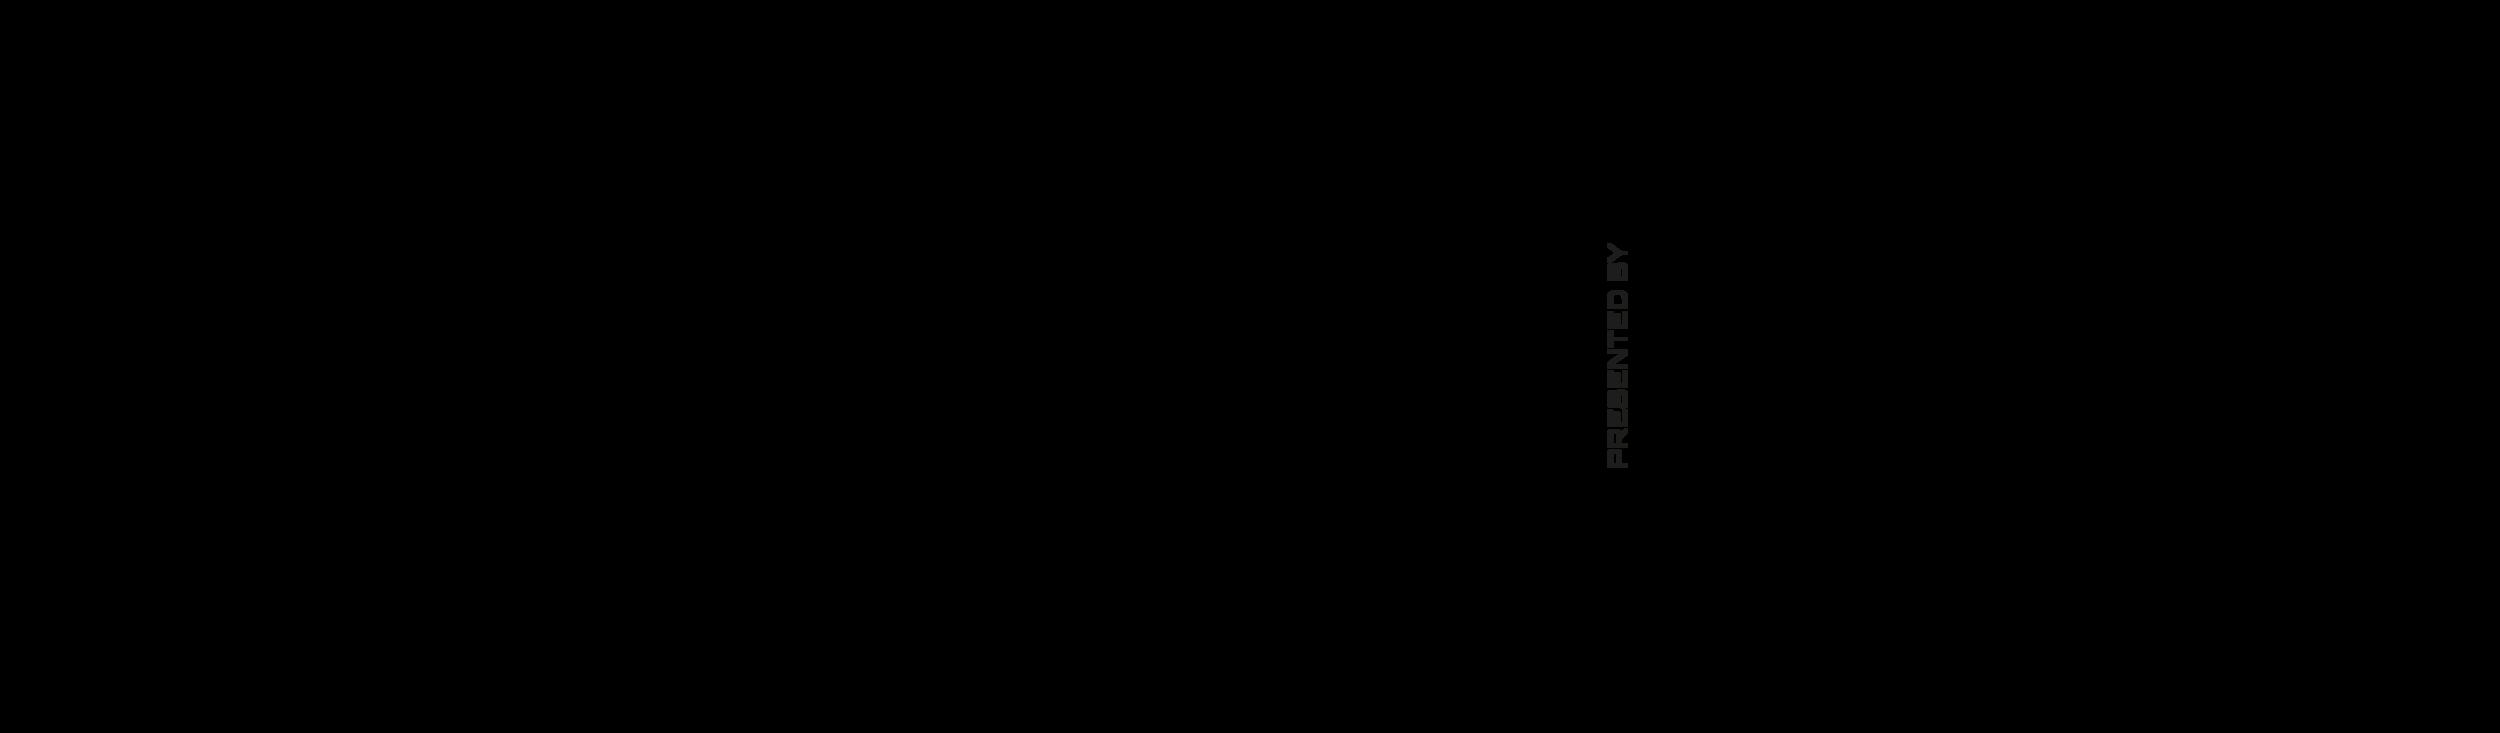 UTCT2017 LOGO_LONG-BLK.png